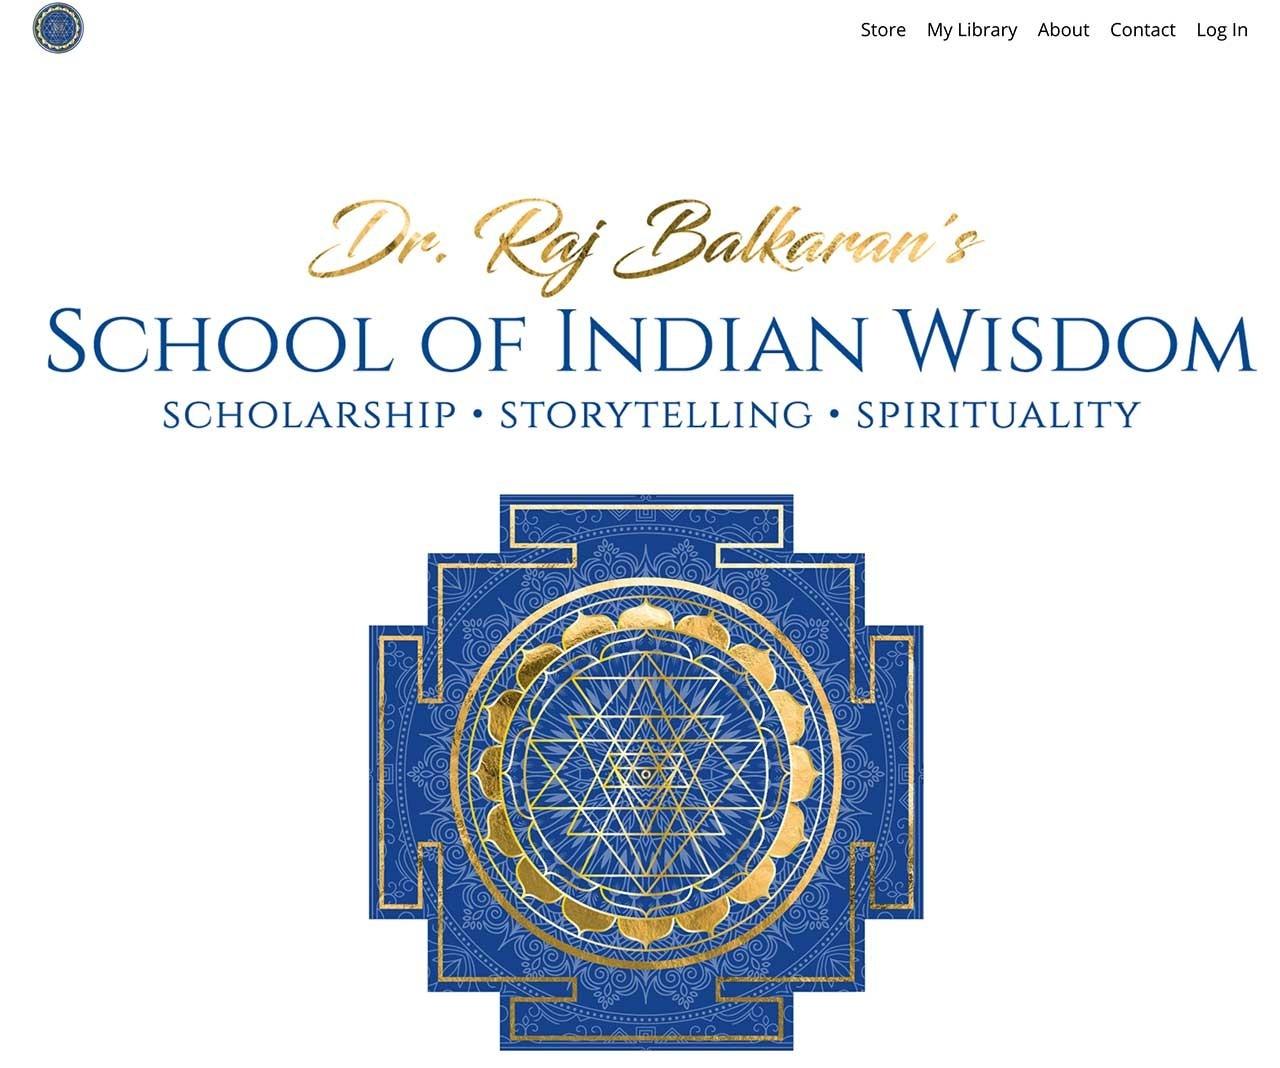 School of Indian Wisdom is built on the Kajabi Platform